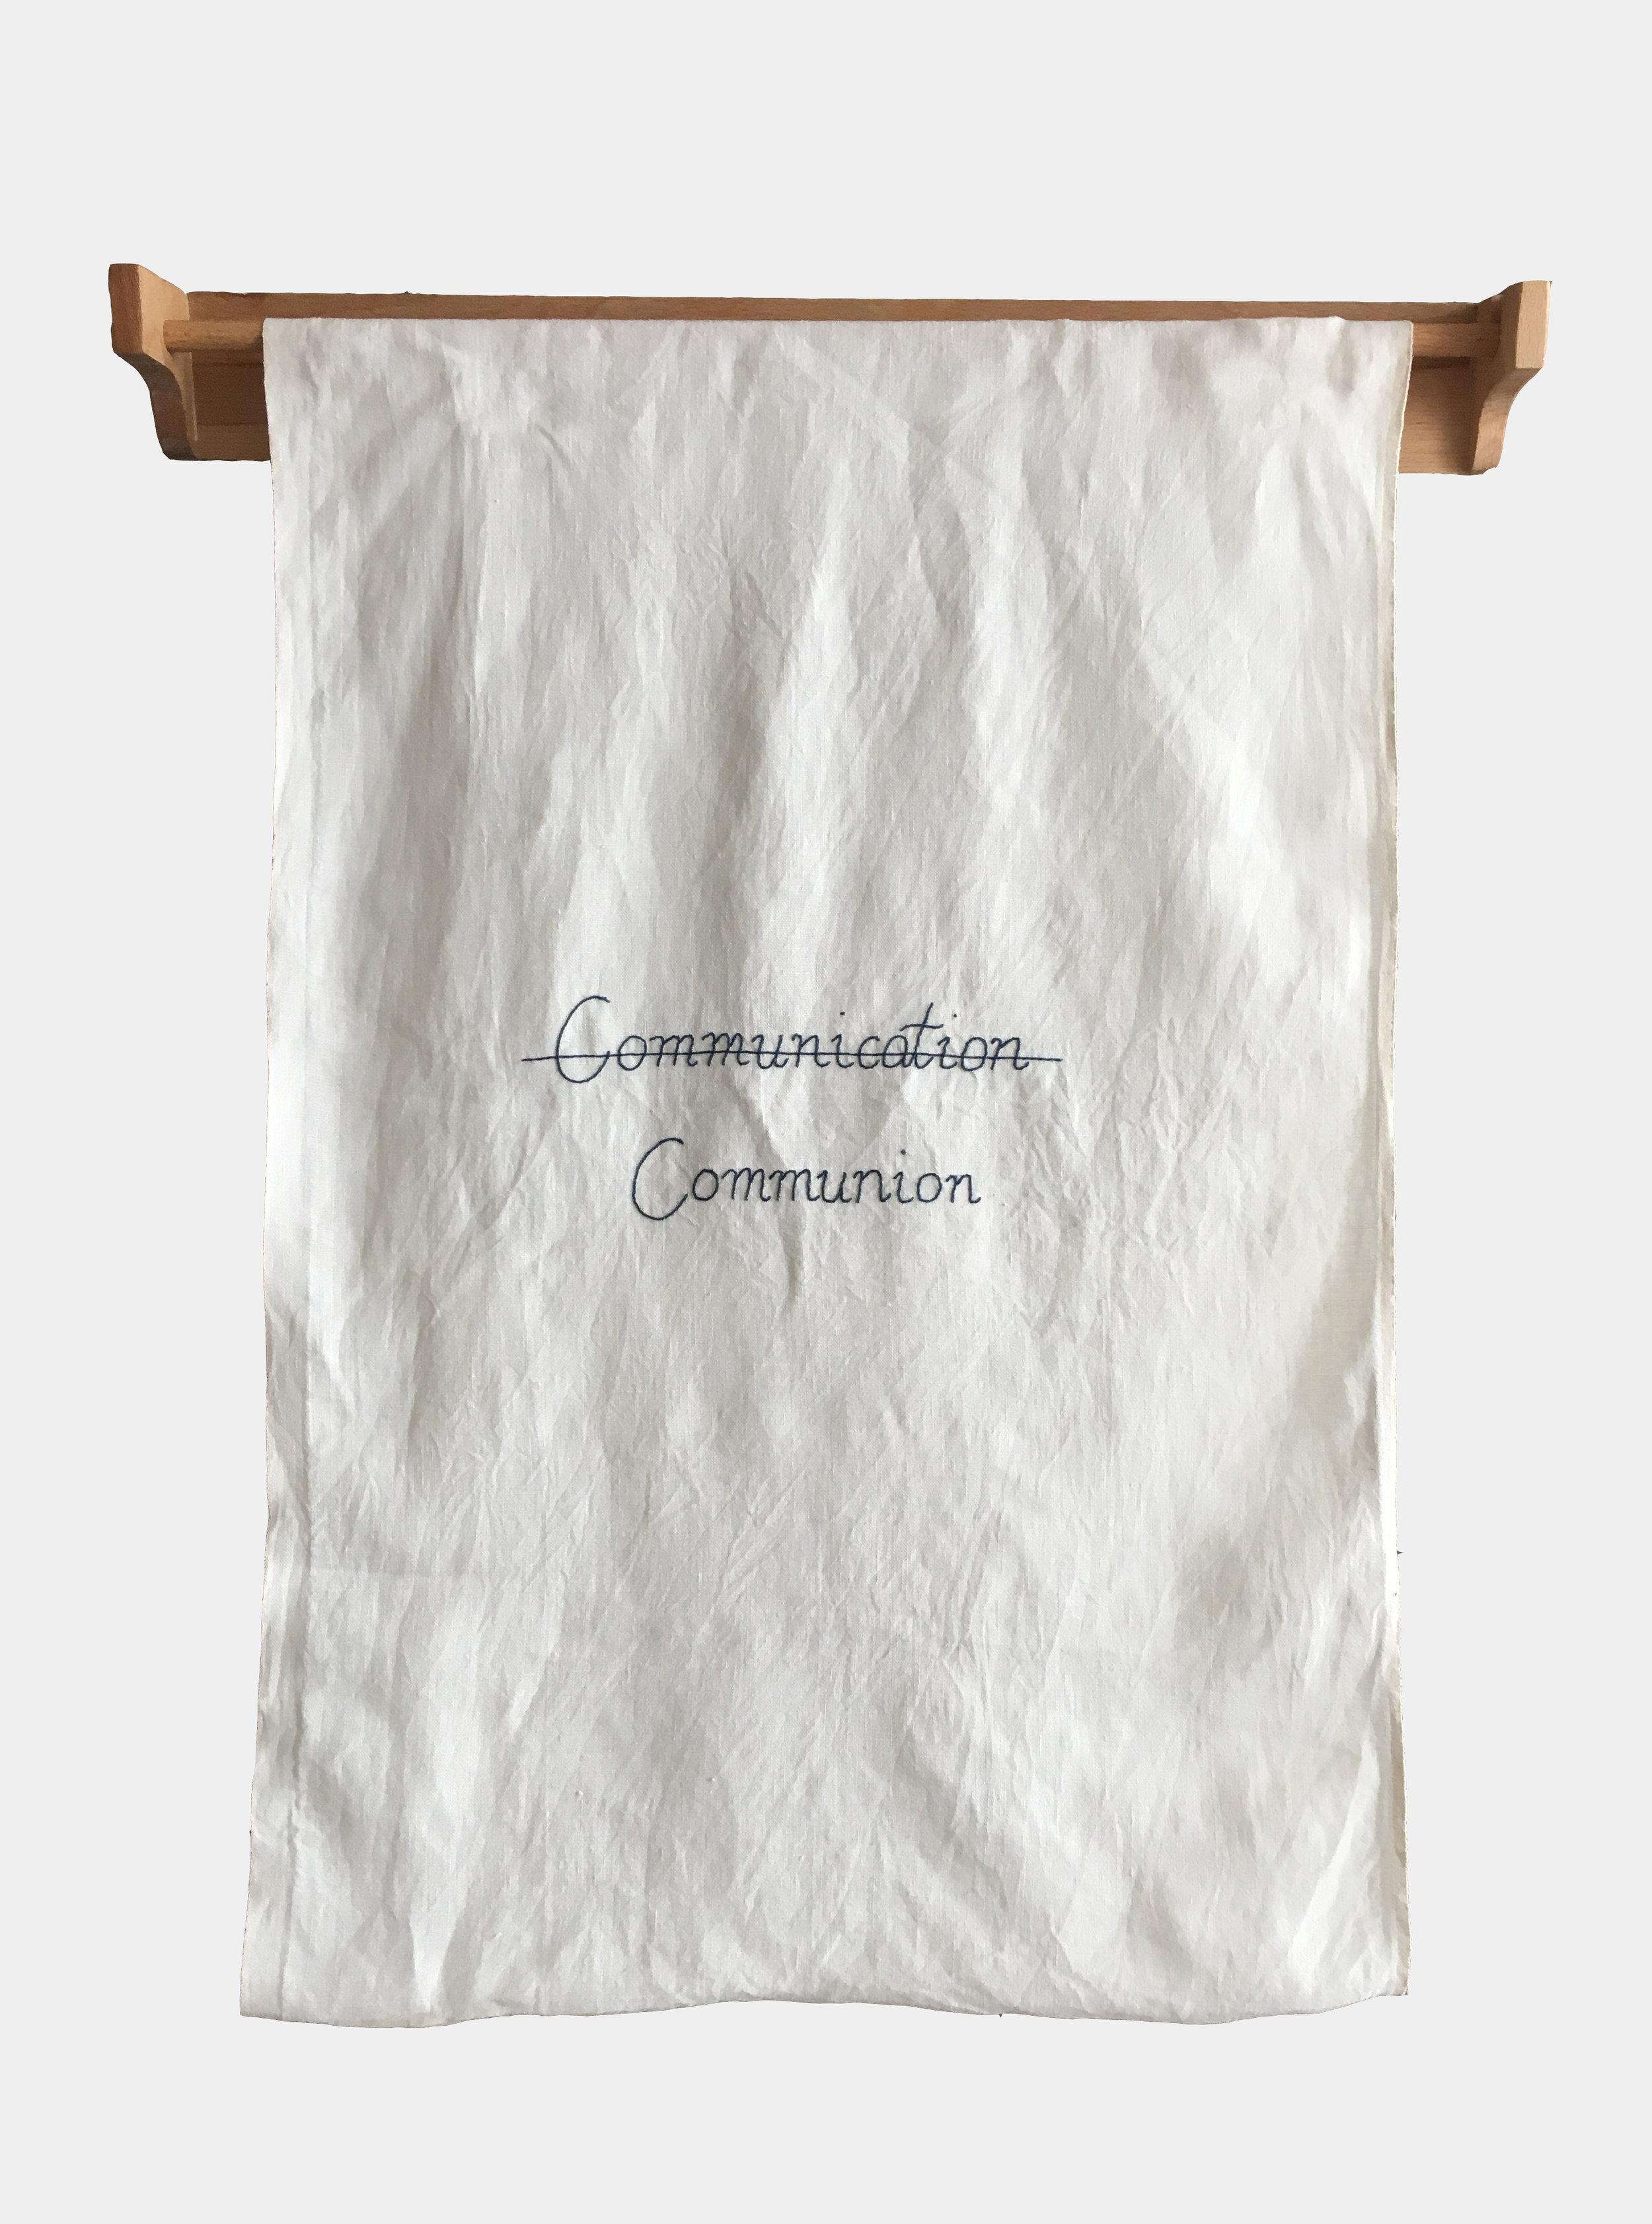 Communication Communion, 2018